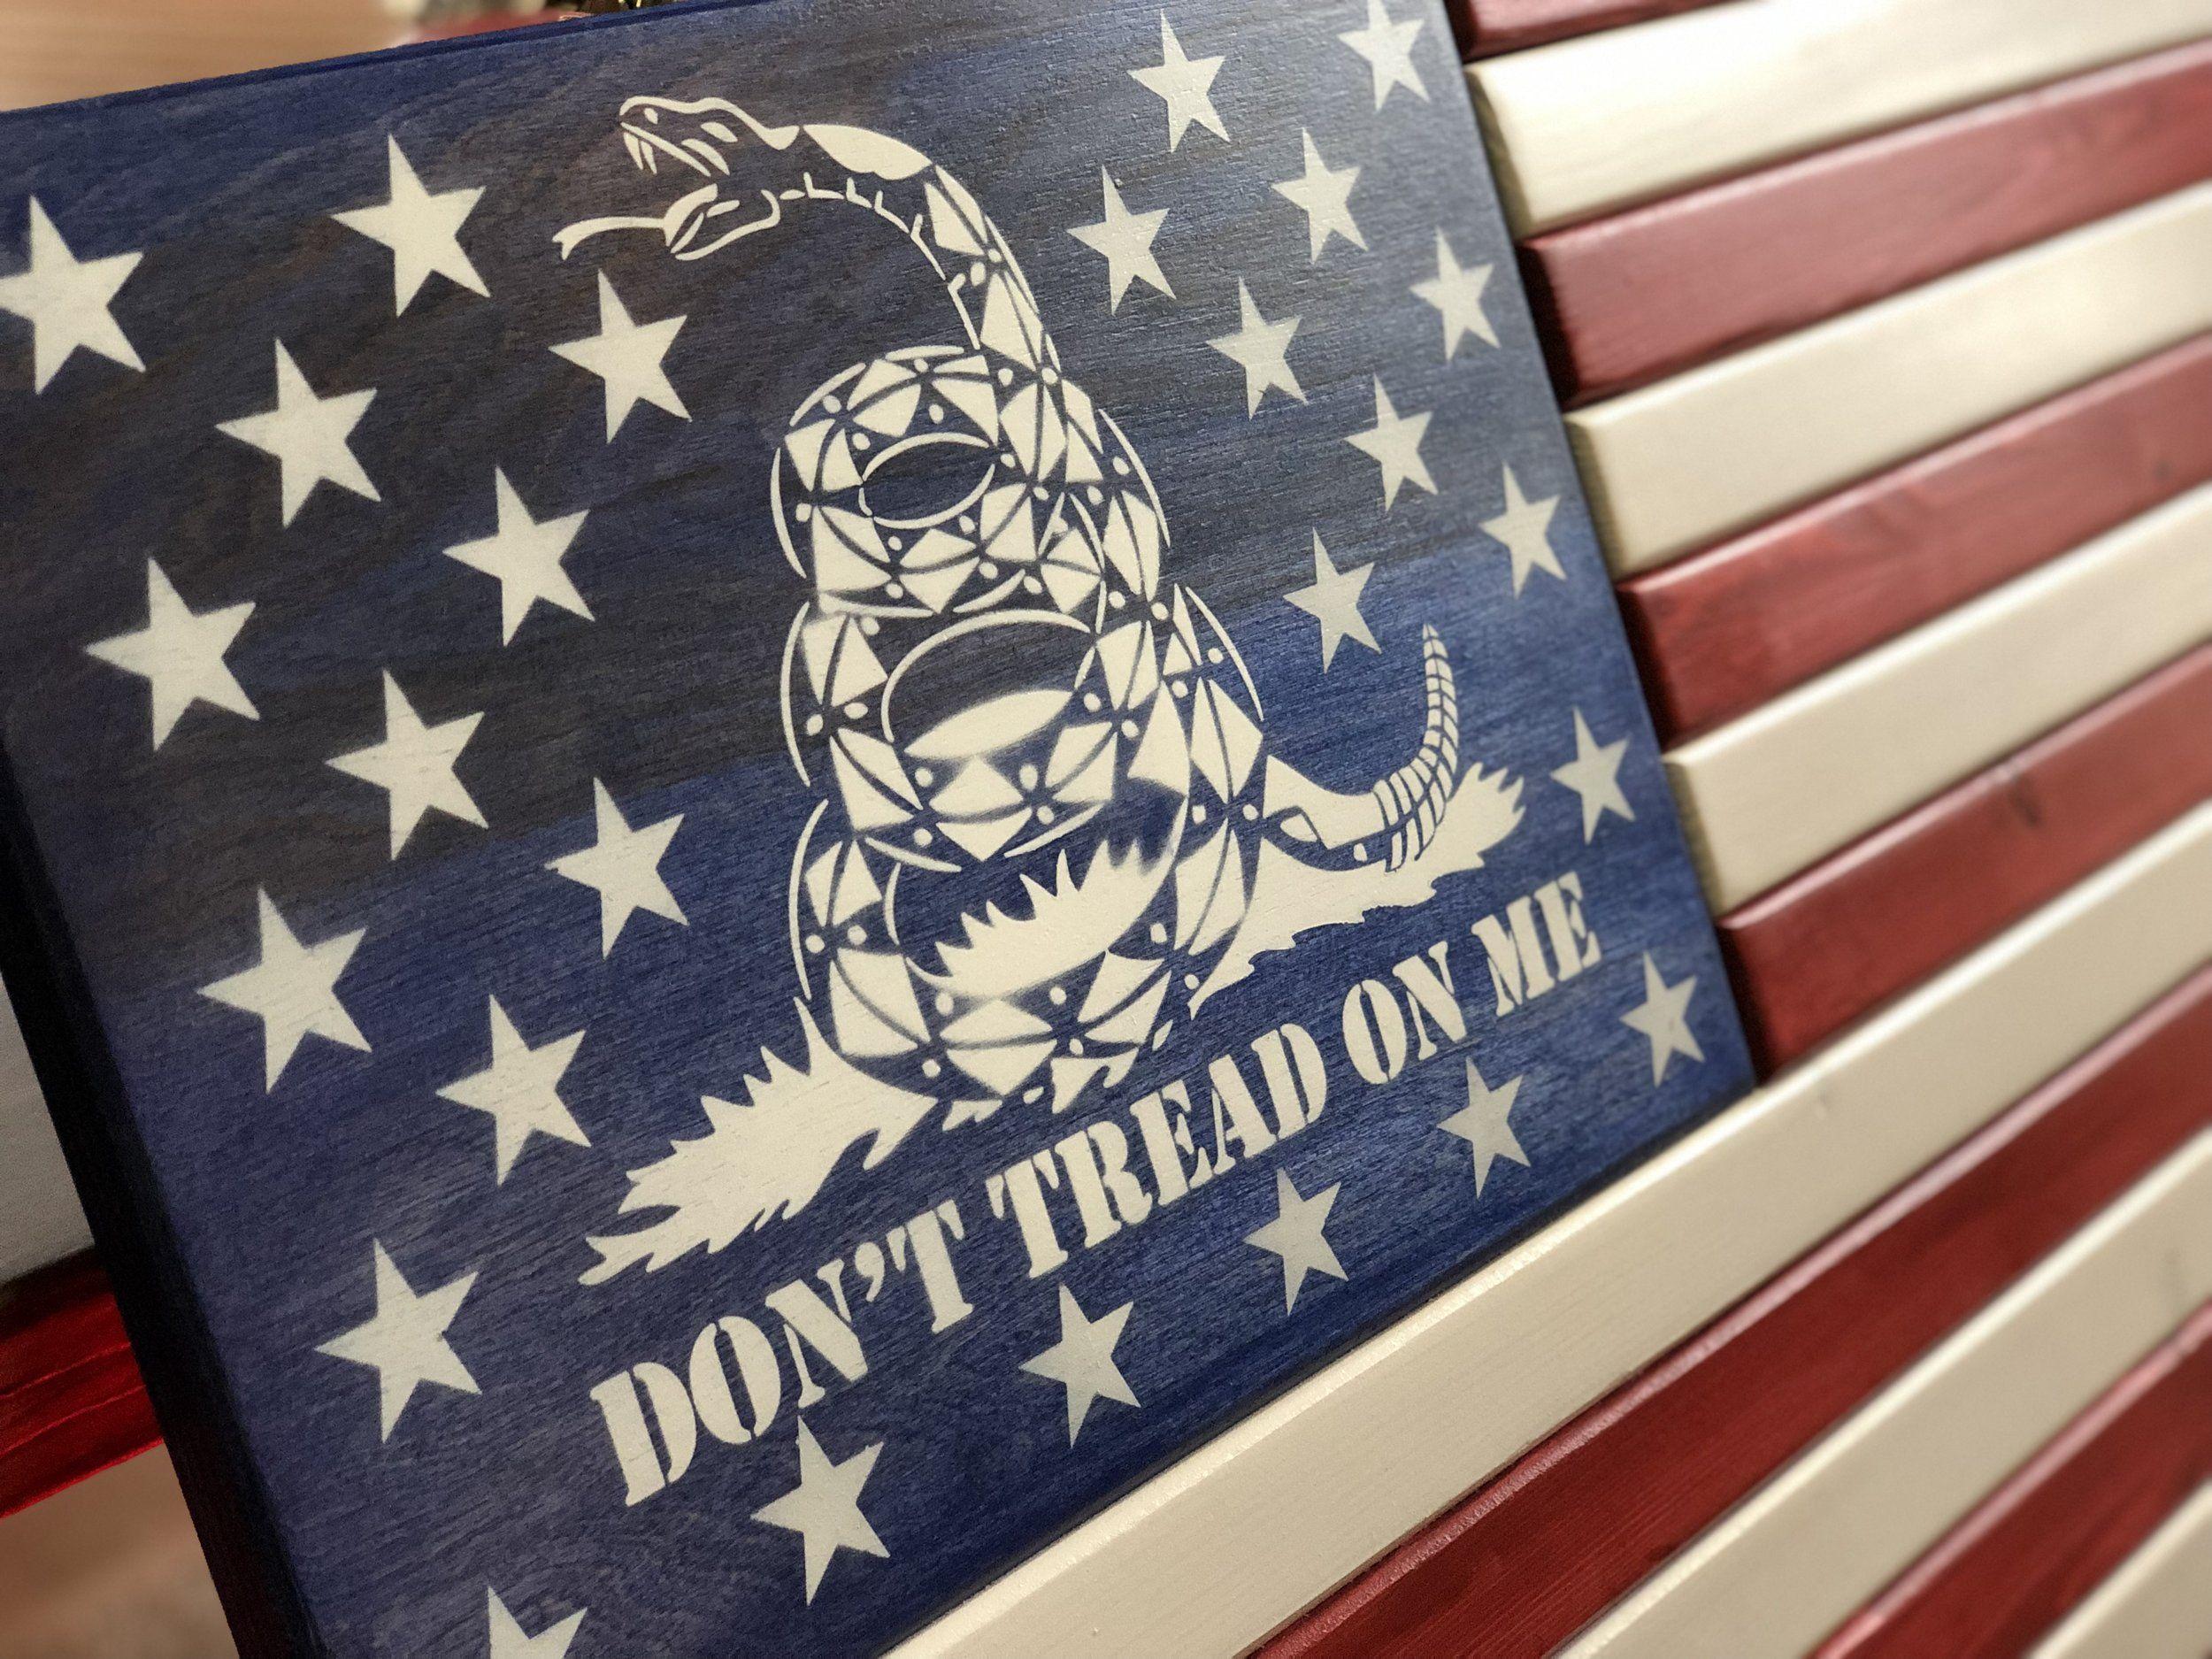 Don T Tread On Me Flag Gadsden Flag Gadsden Wall Art Gadsden Home Decor Gadsden Office Decor American Flag Wall Art American Flag Wood Man Cave Decor